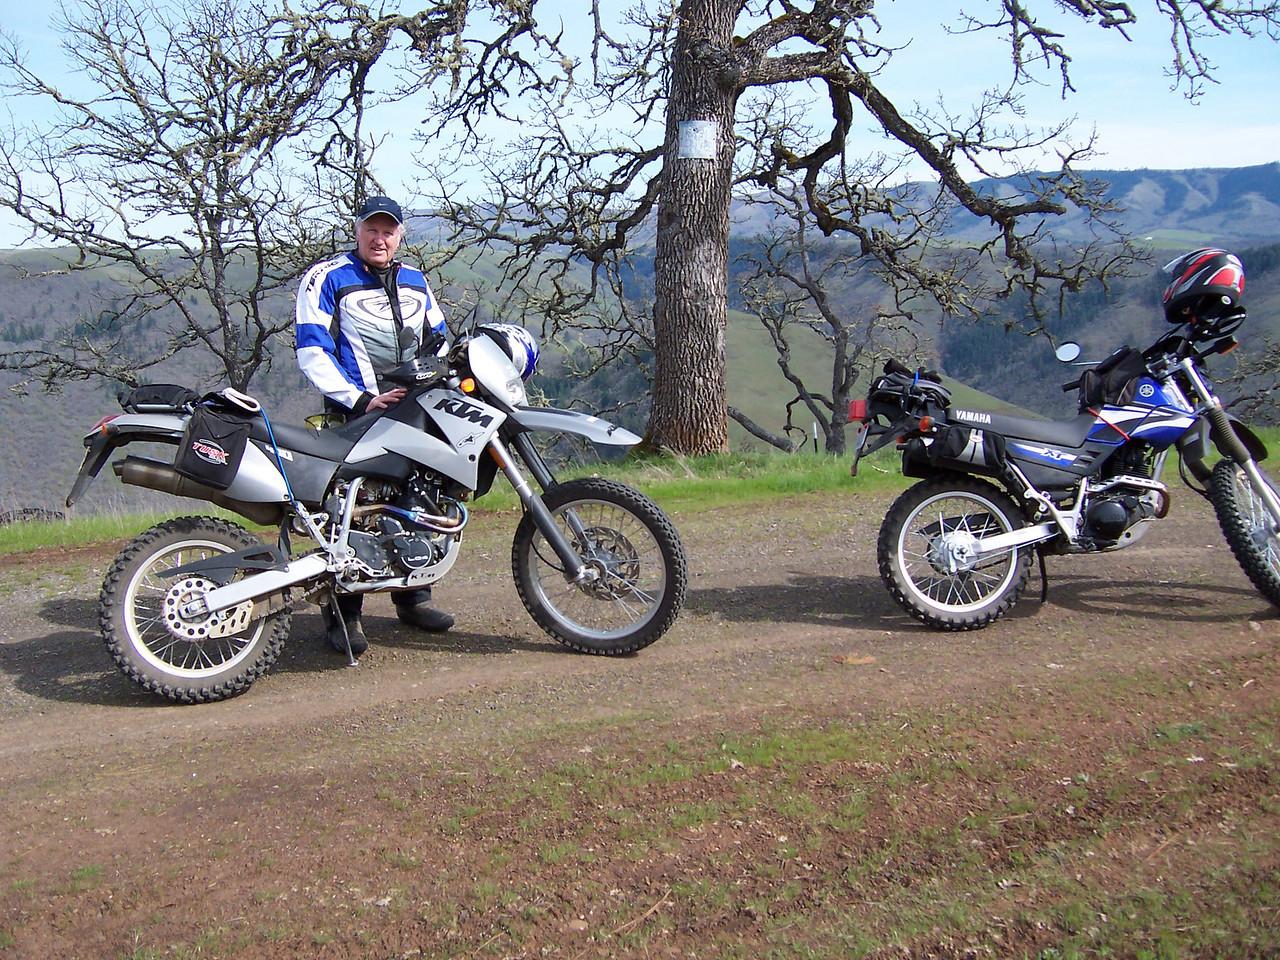 Fisher Hill Rd running along Klickitat Canyon